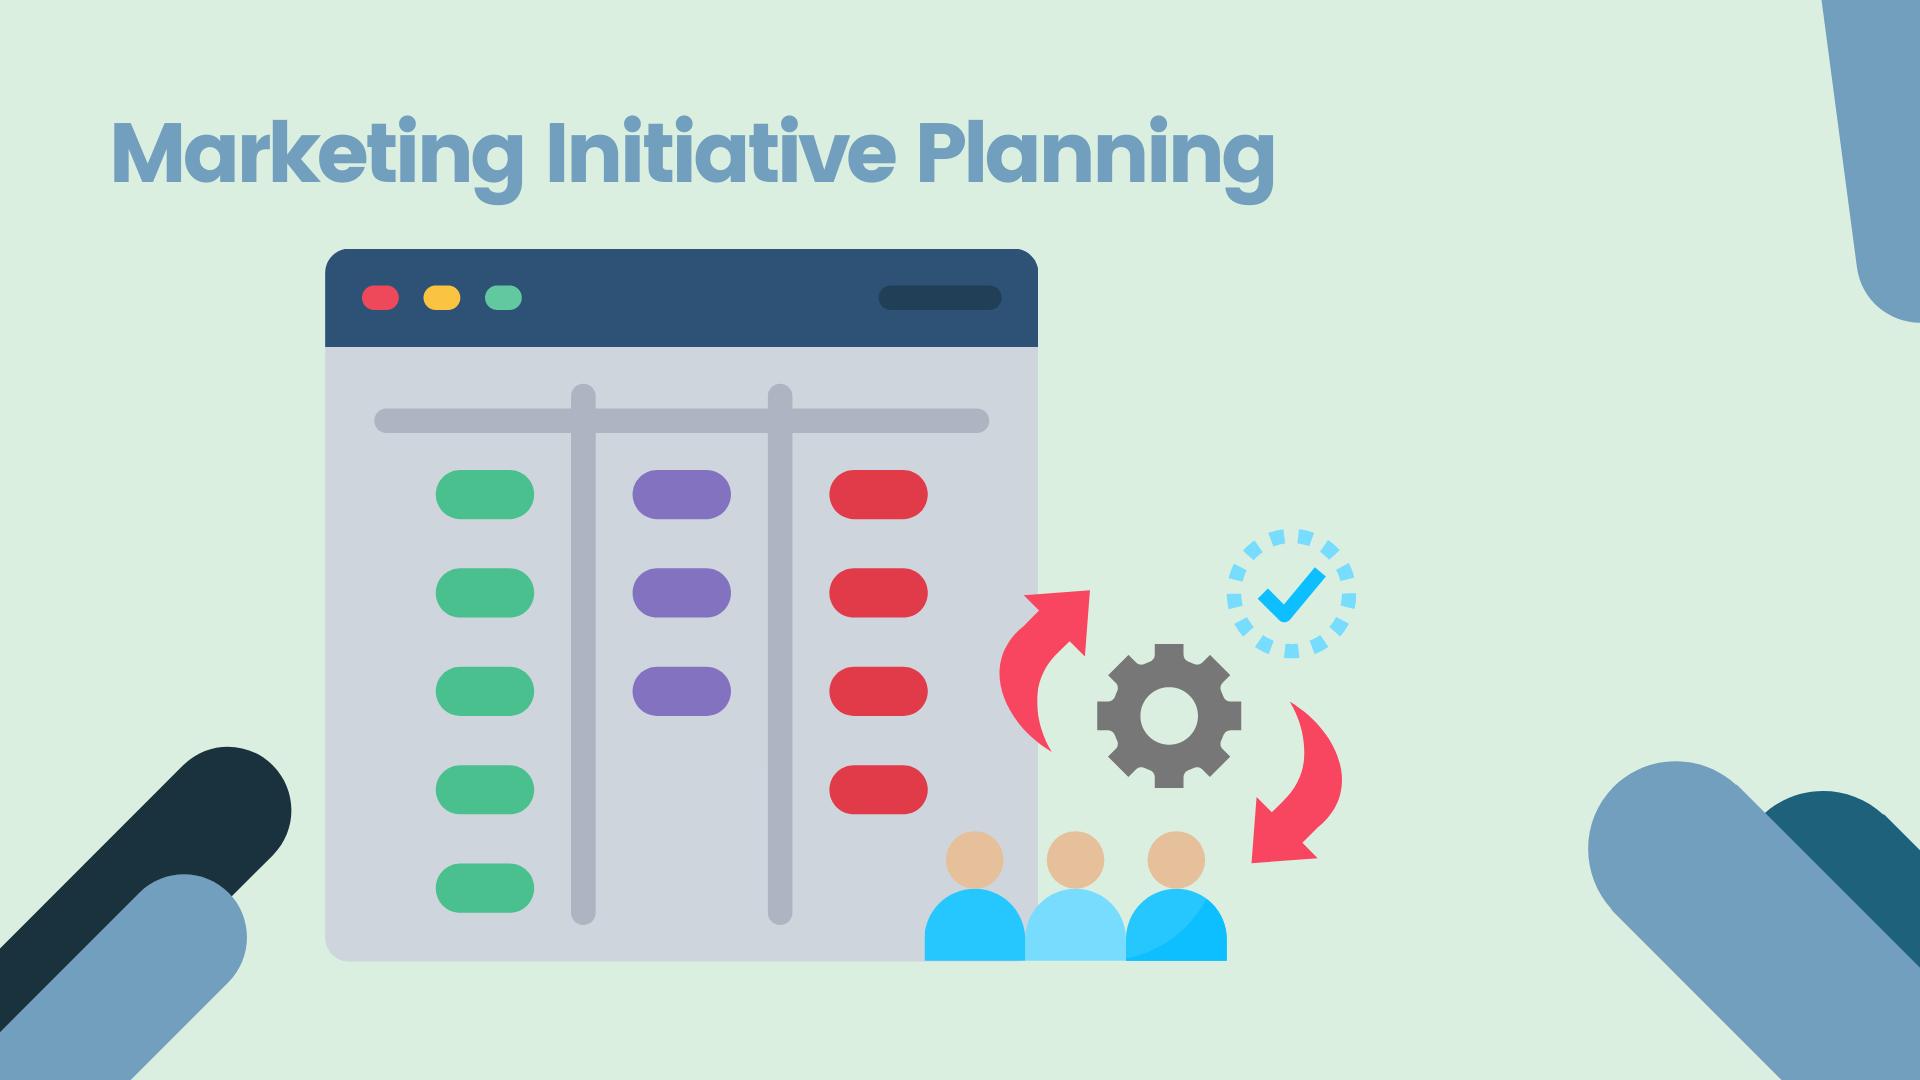 Marketing Initiative Planning